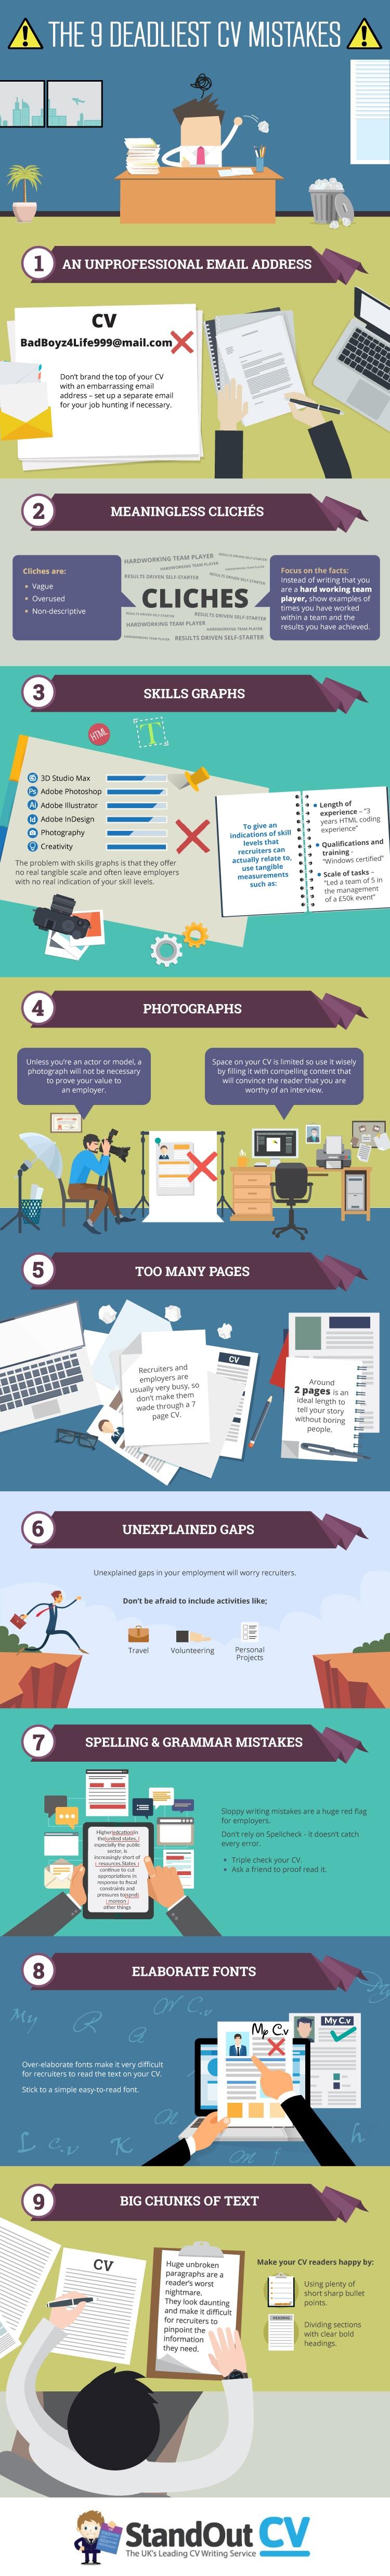 Infographic on resume advice for avoiding common CV mistakes